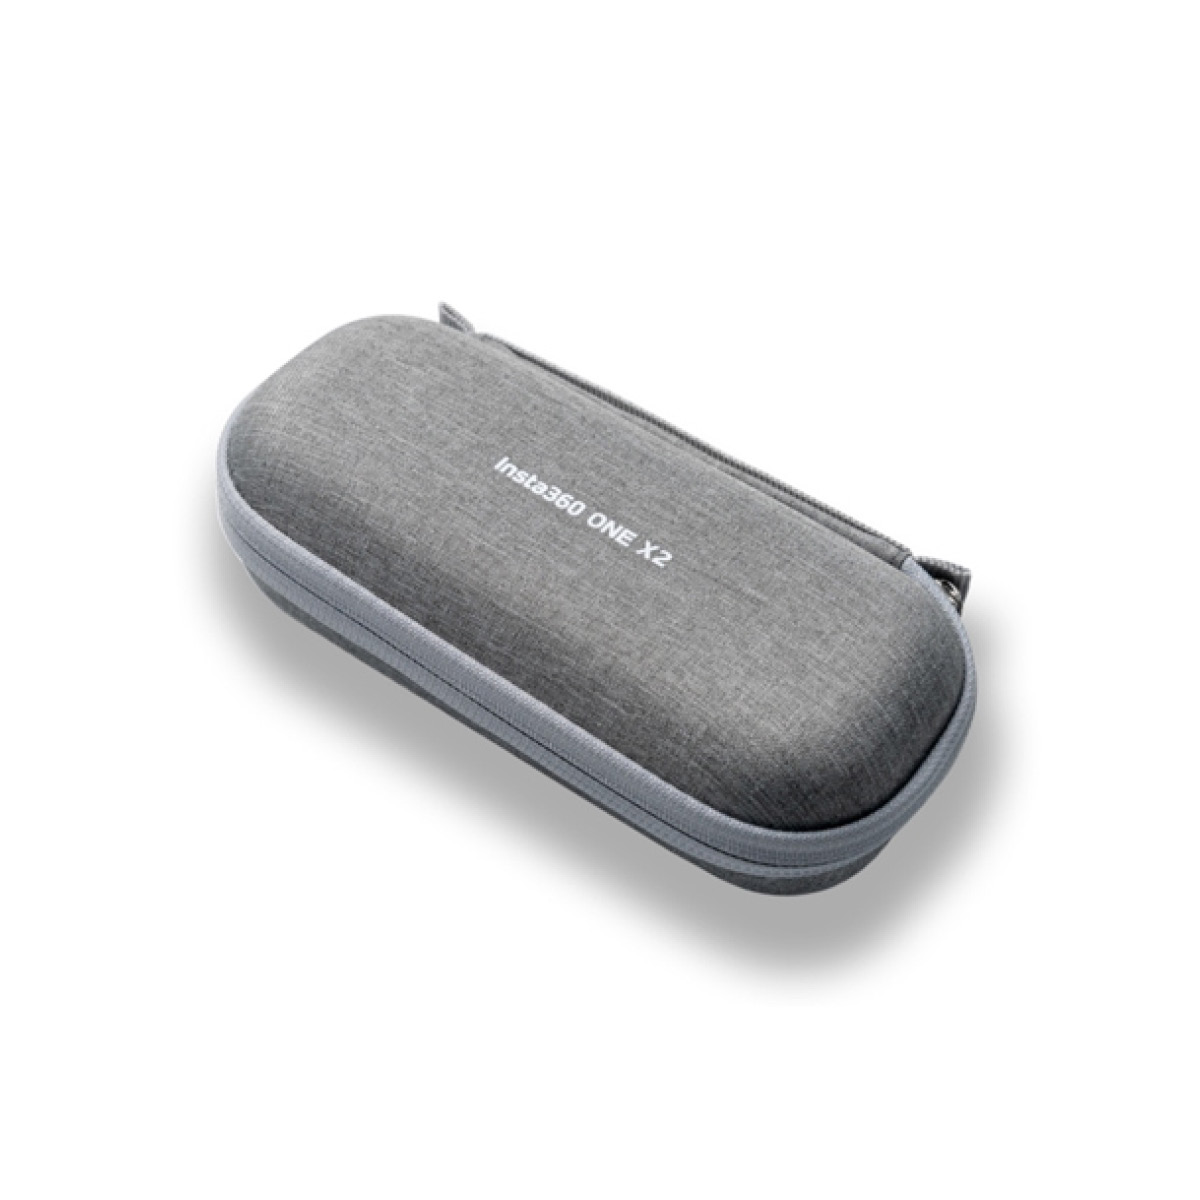 Insta360 One X2 Carrycase